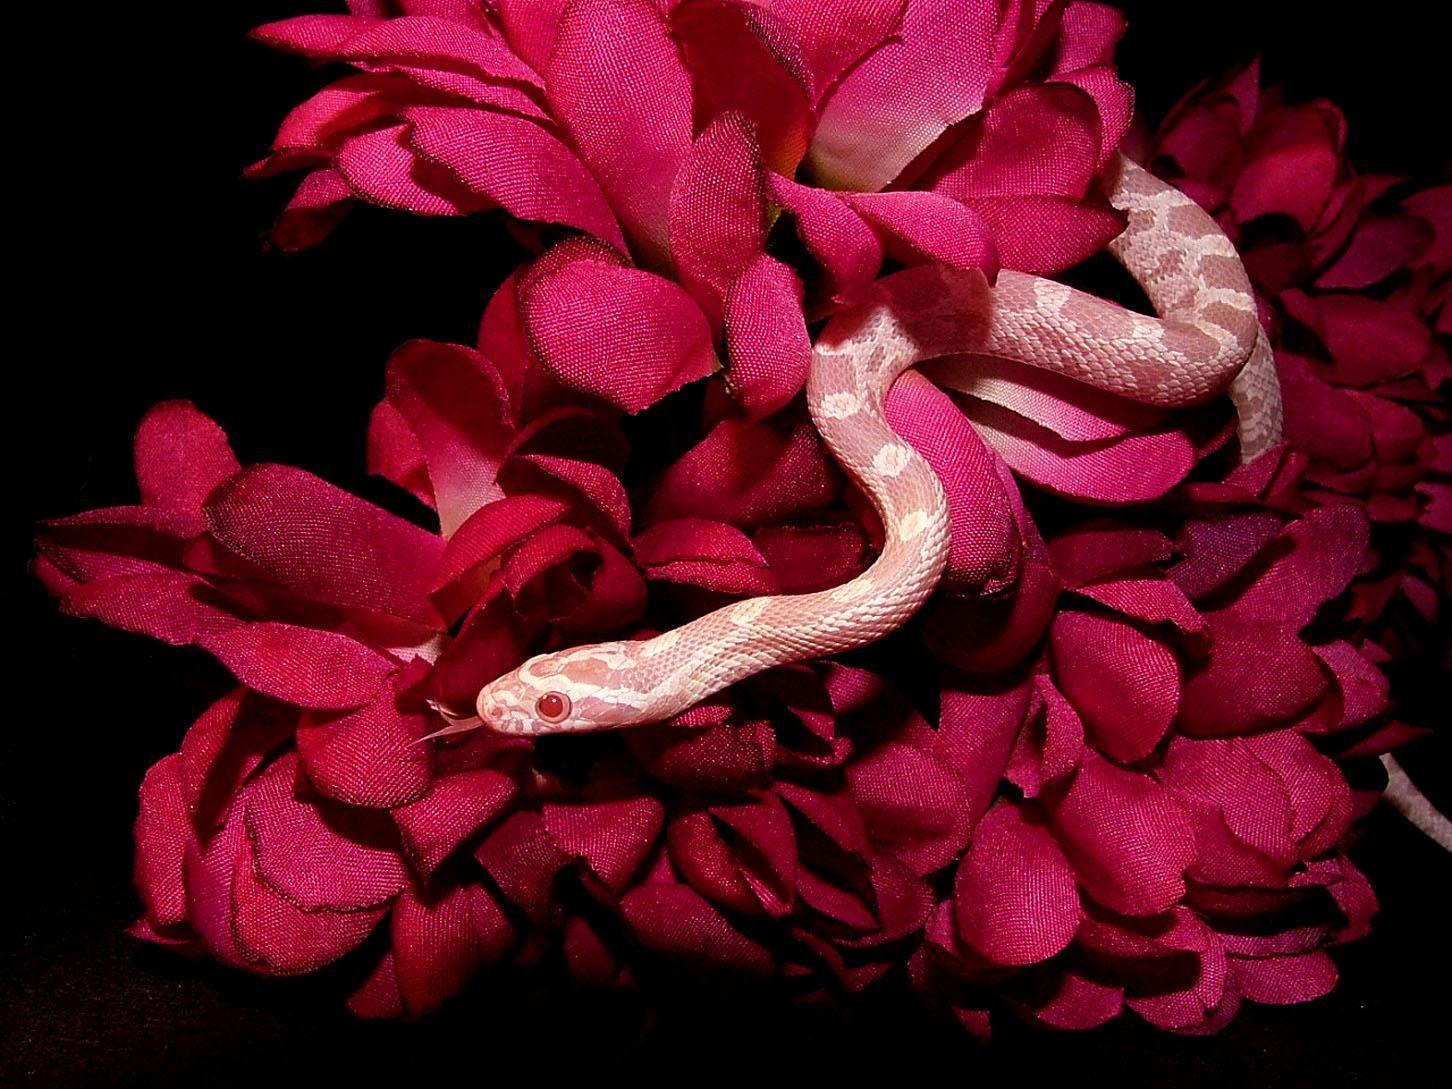 Download Snake Wallpaper Hd Backgrounds Download Itl Cat